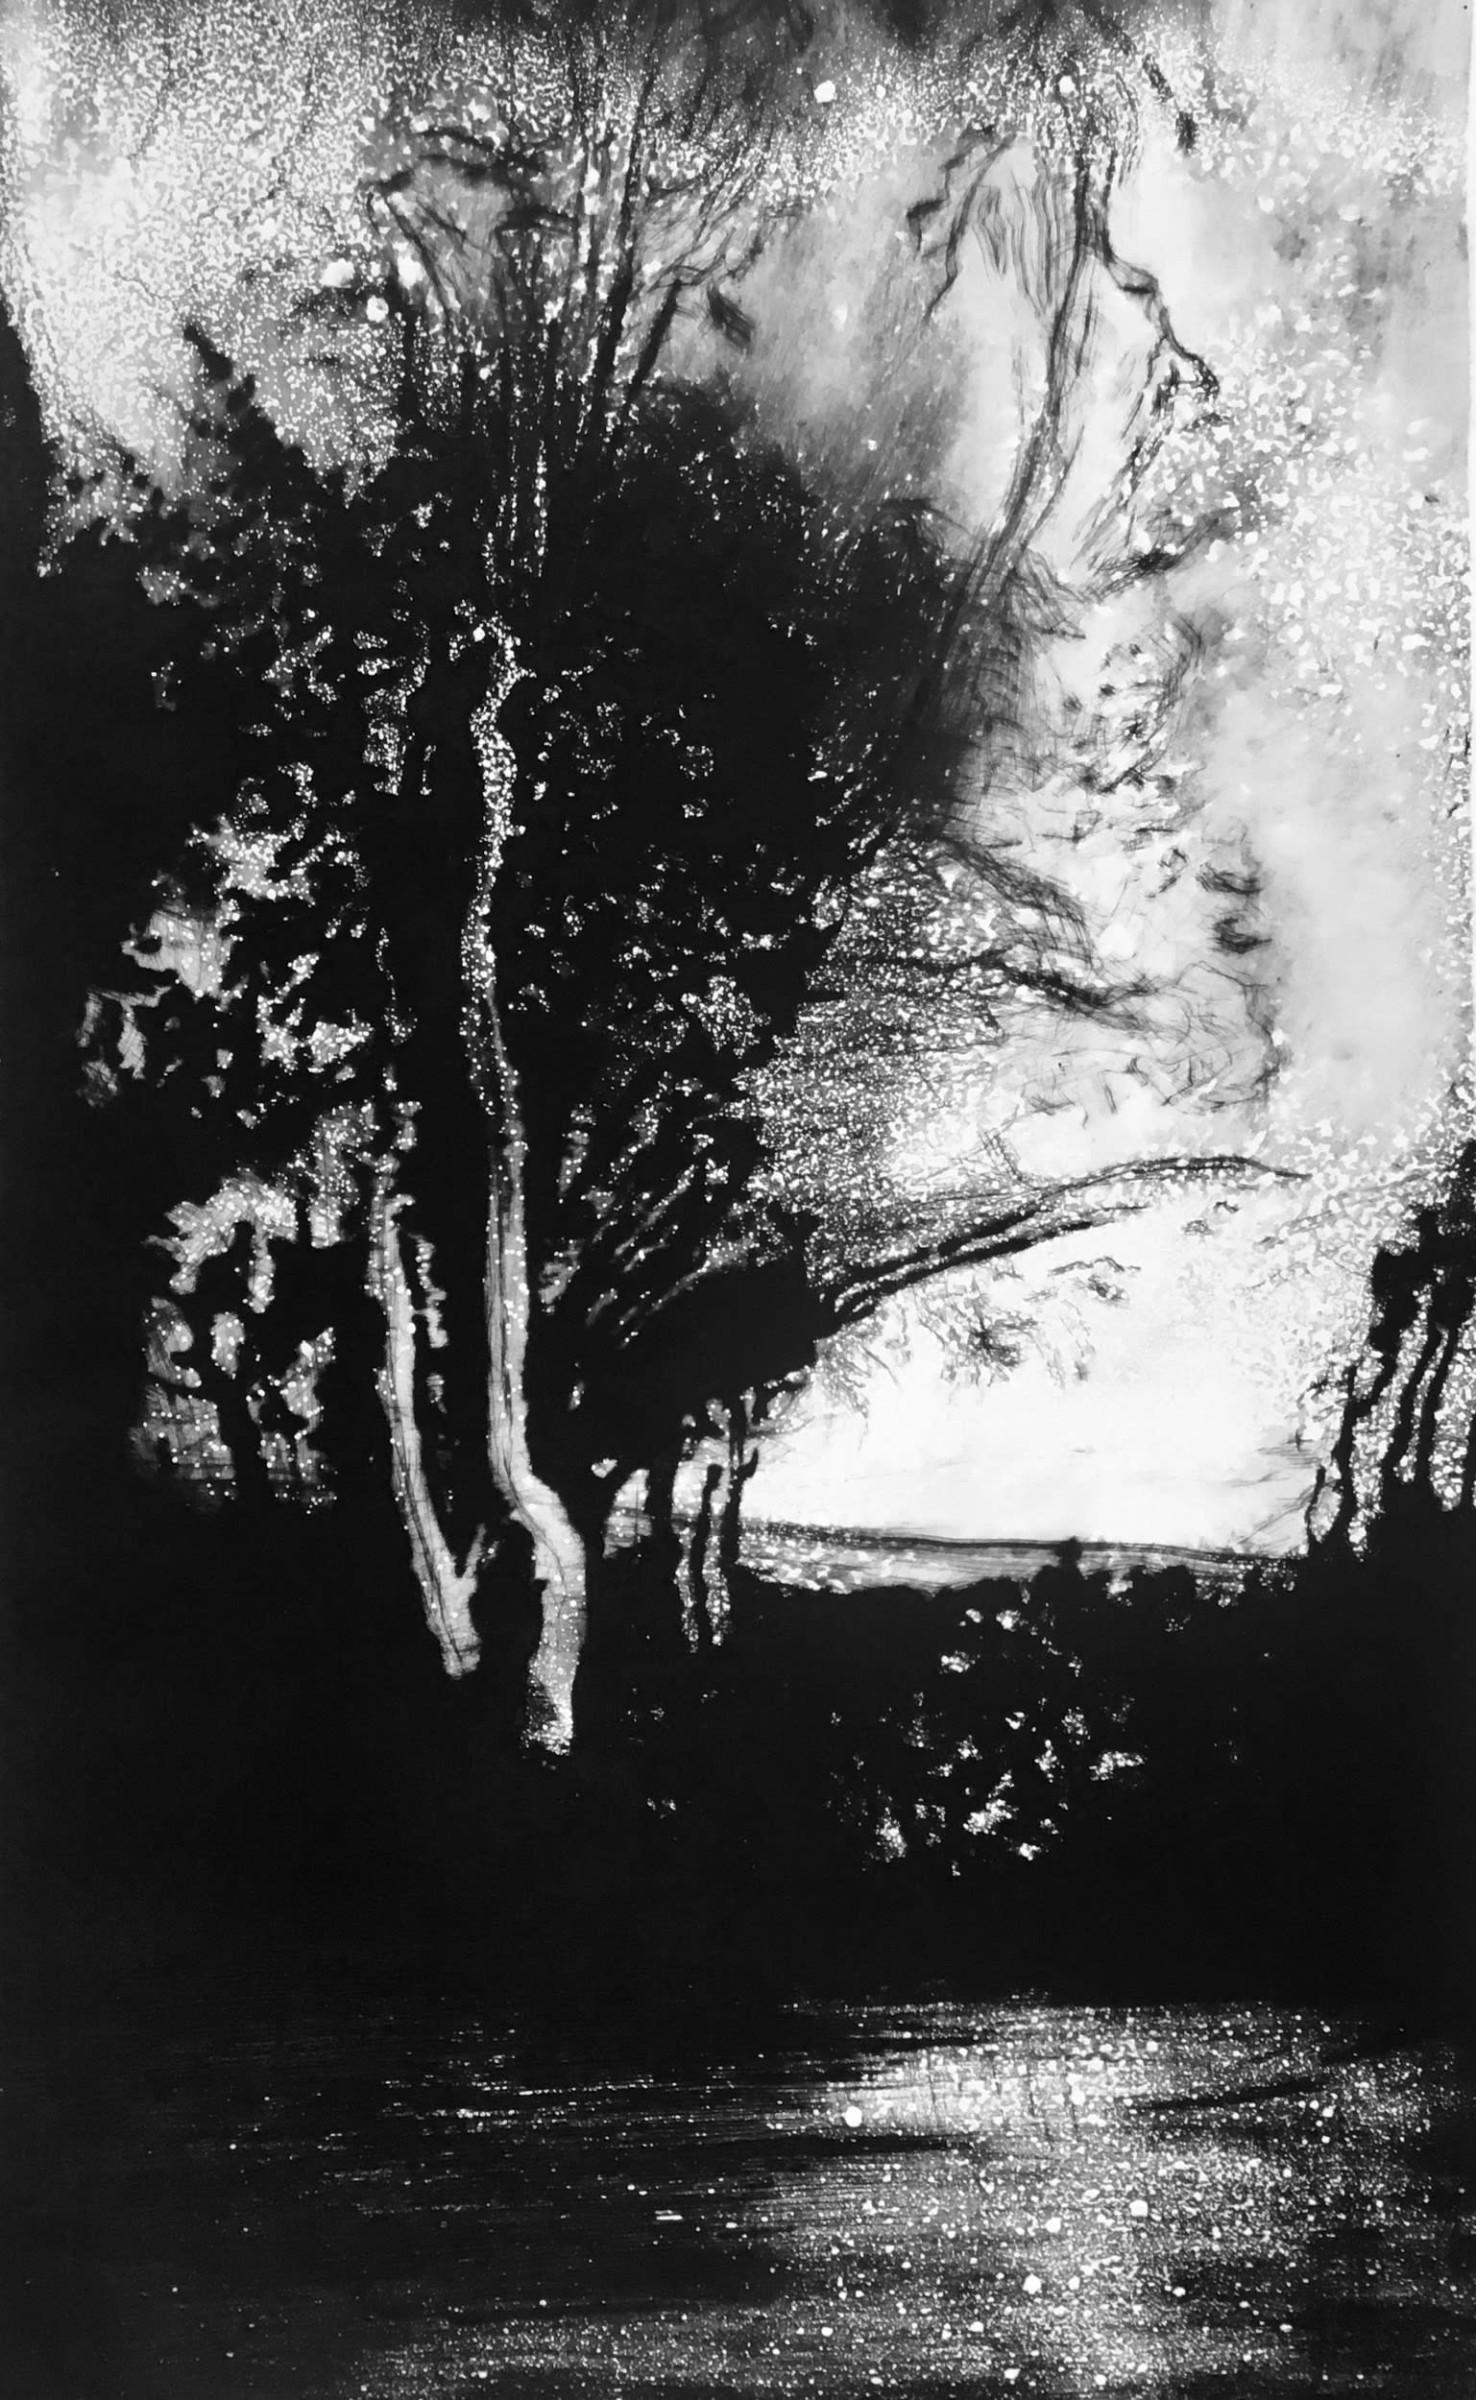 "<span class=""link fancybox-details-link""><a href=""/exhibitions/20/works/artworks_standalone10867/"">View Detail Page</a></span><div class=""artist""><span class=""artist""><strong>Edward Twohig RE</strong></span></div><div class=""title""><em>December Light, Master's Garden, Marlborough, Wiltshire</em></div><div class=""medium"">etching with drypoint</div><div class=""dimensions"">100 x 60cm image size</div><div class=""edition_details"">edition of 10</div>"